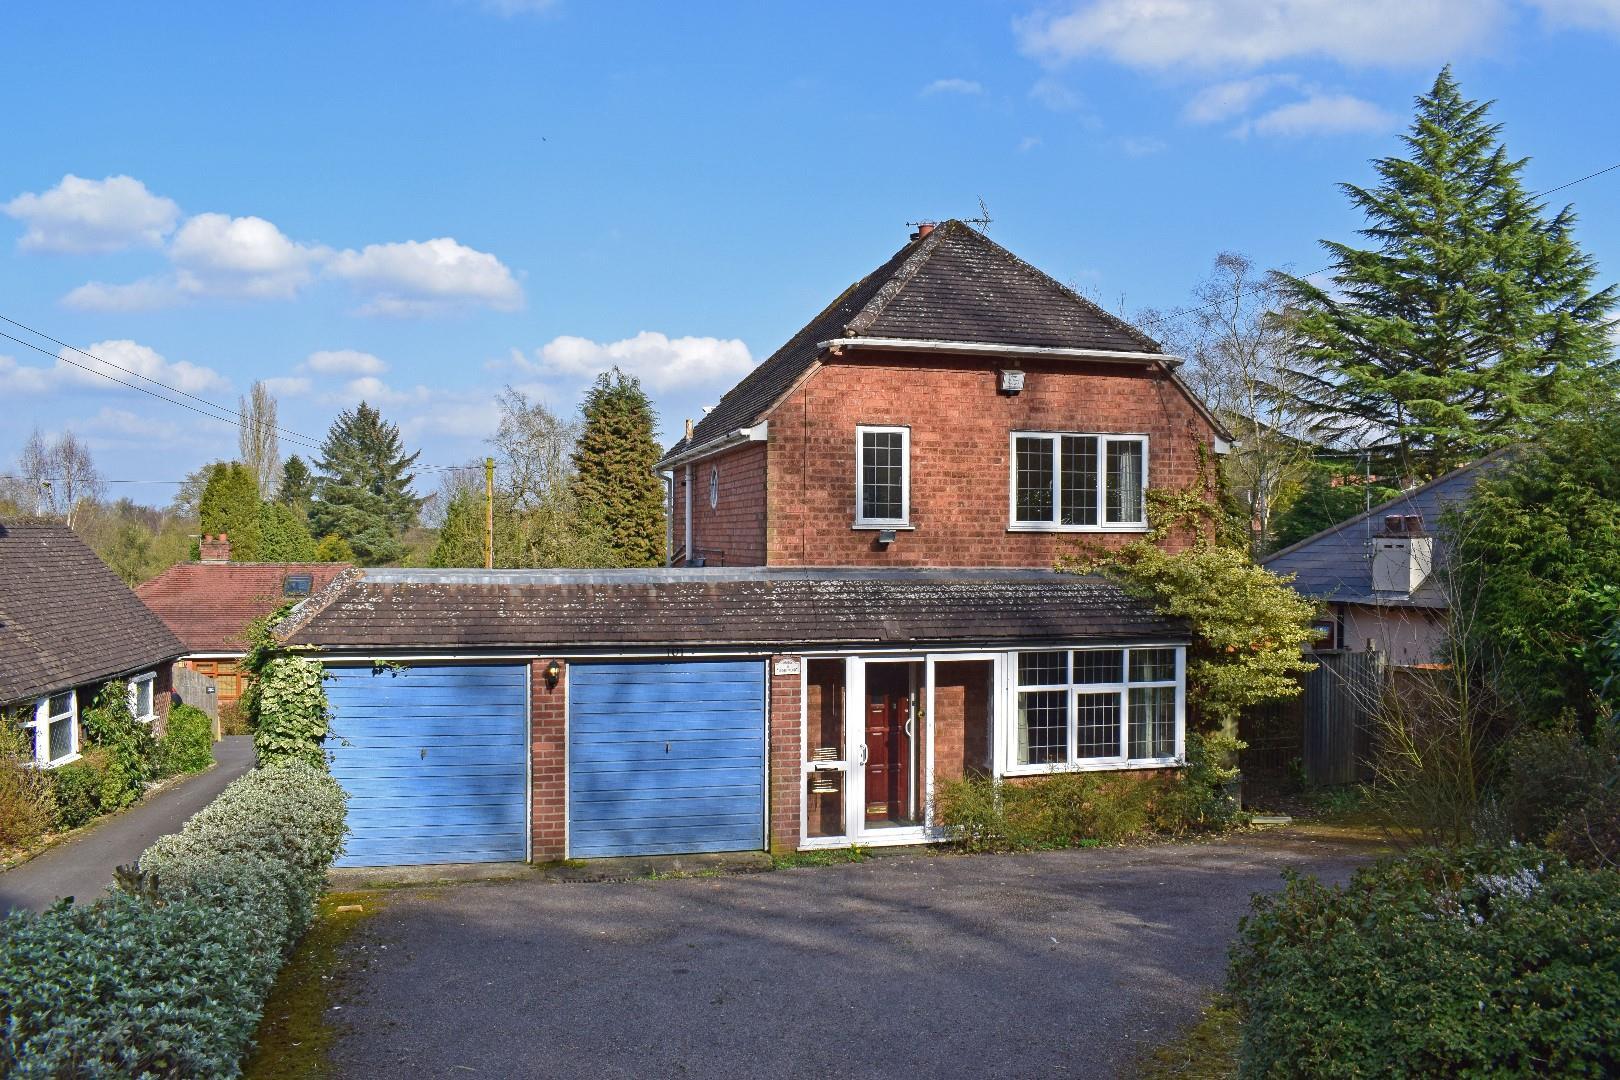 101 Barnt Green Road, Cofton Hackett, B45 8PH